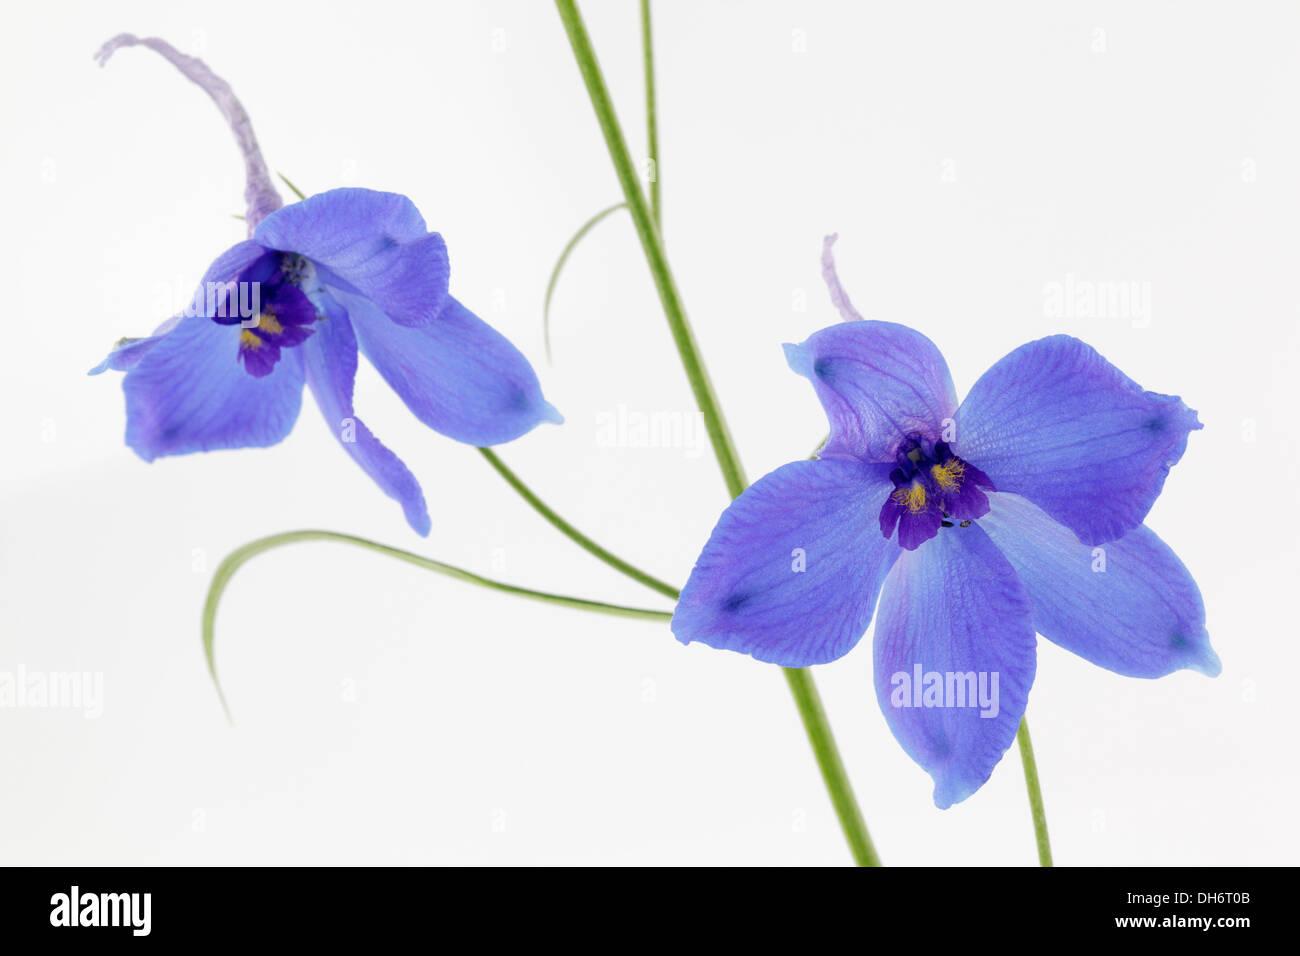 Delphiniums azules sobre fondo blanco. Imagen De Stock